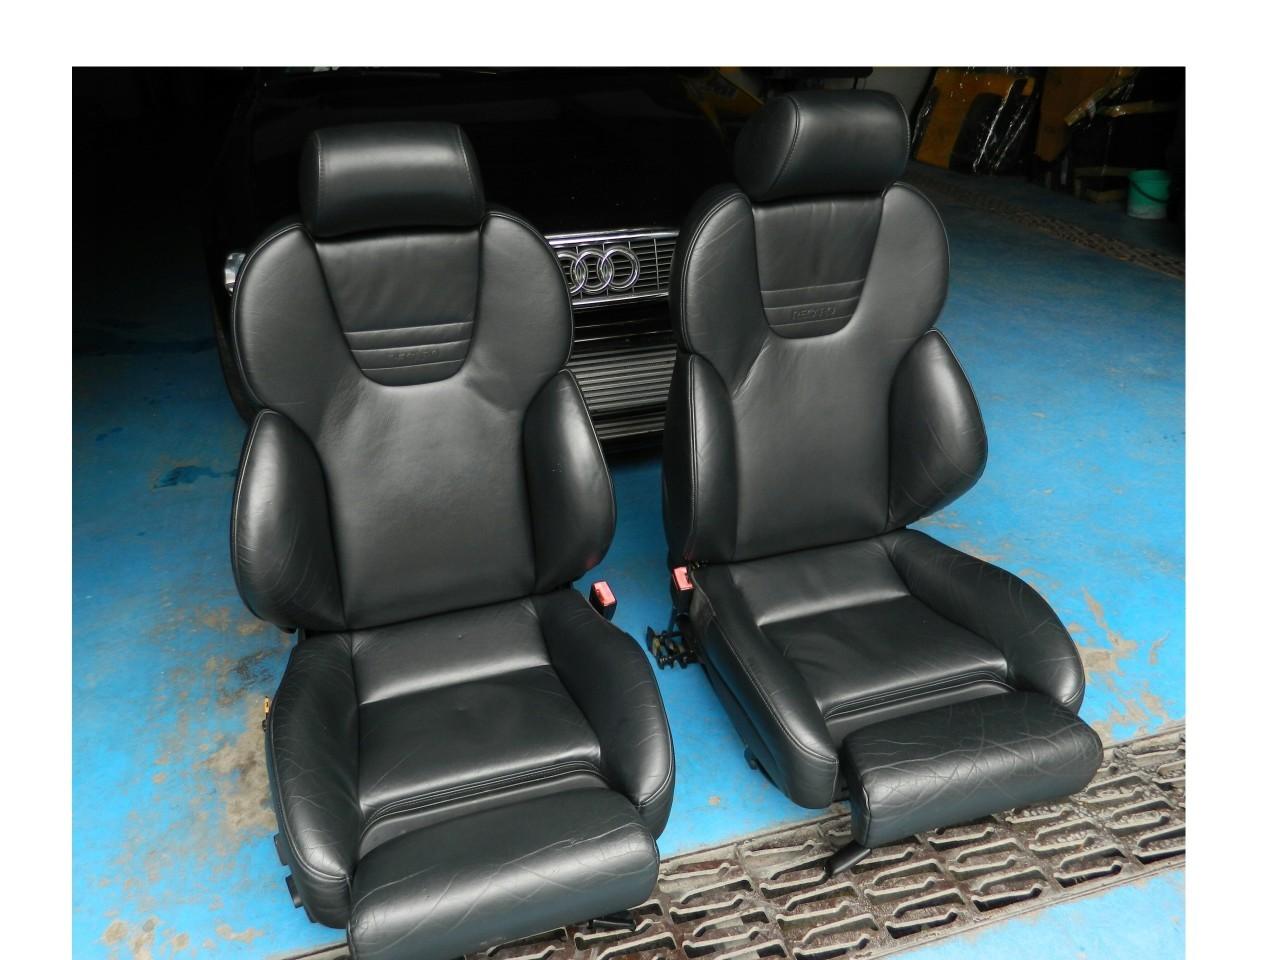 caut sa cumpar scaune recaro pt AUDI a4 b5 an 1995 . scaune fata si spate  watssap  0034642866756